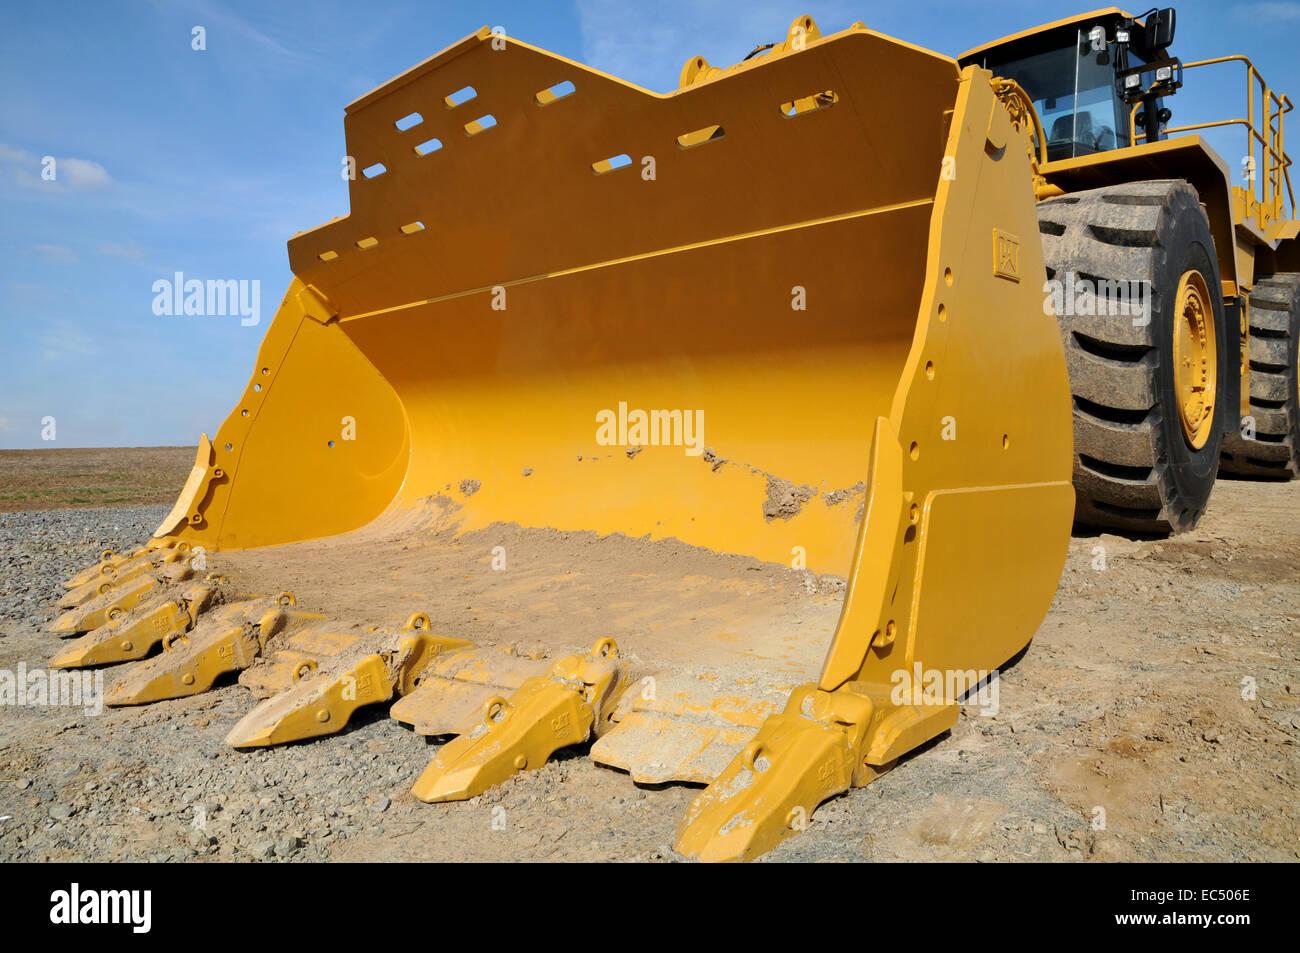 loaders excavators, - Stock Image